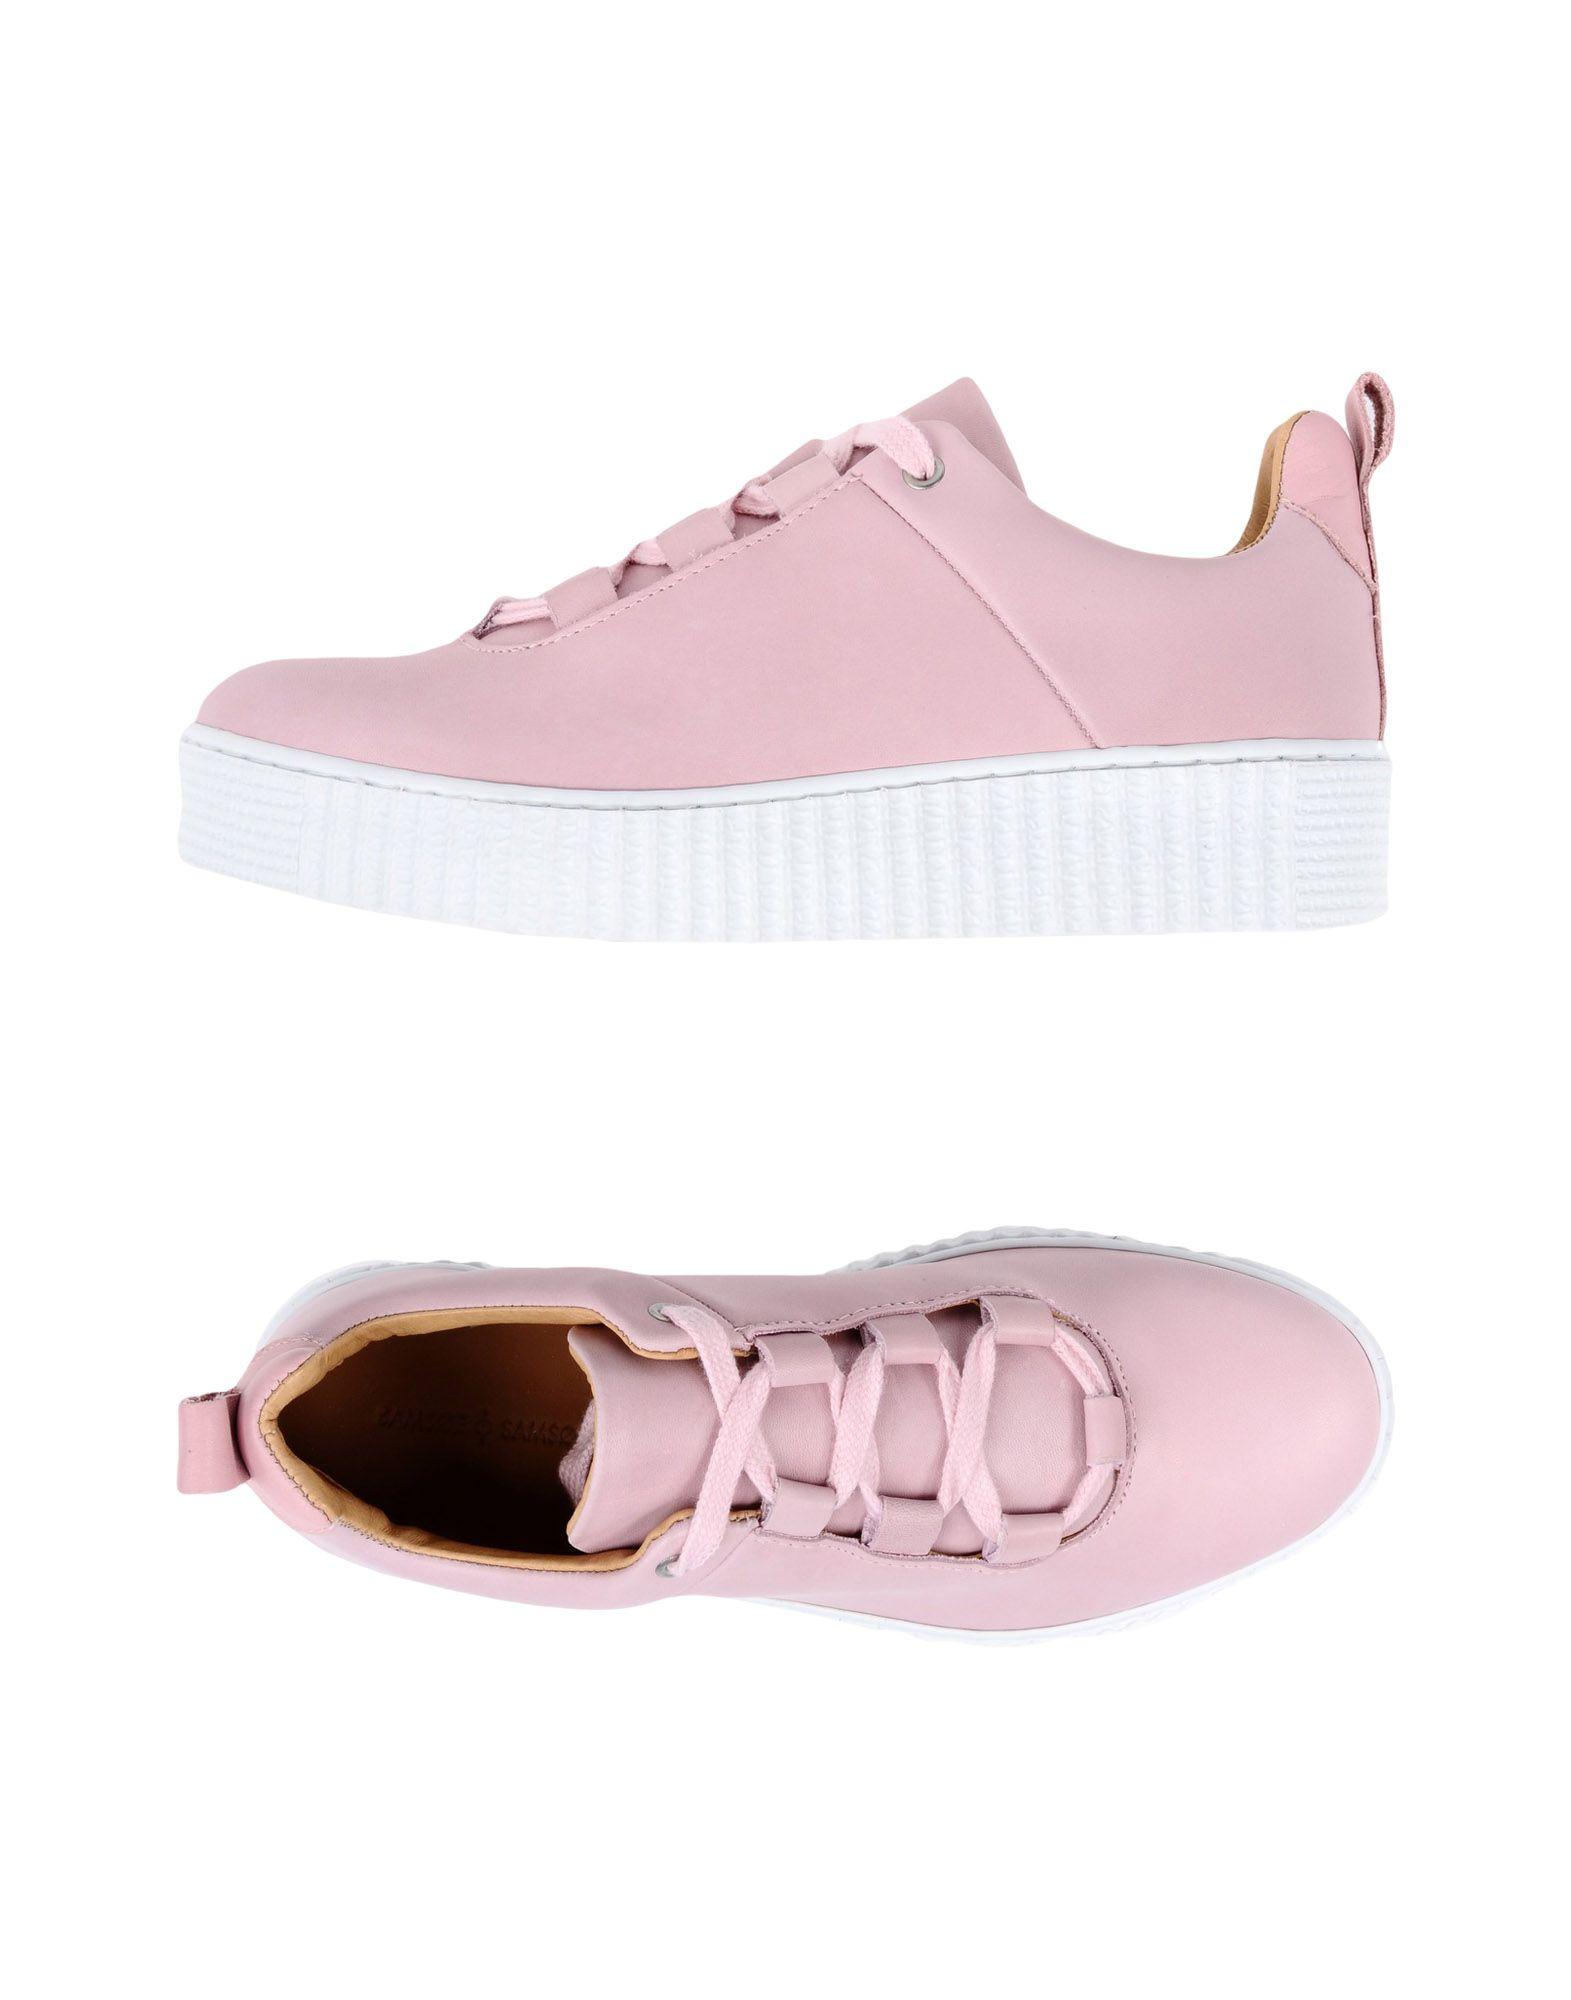 Sneakers Samsøe Φ Samsøe Val 7556 - Donna - Acquista online su